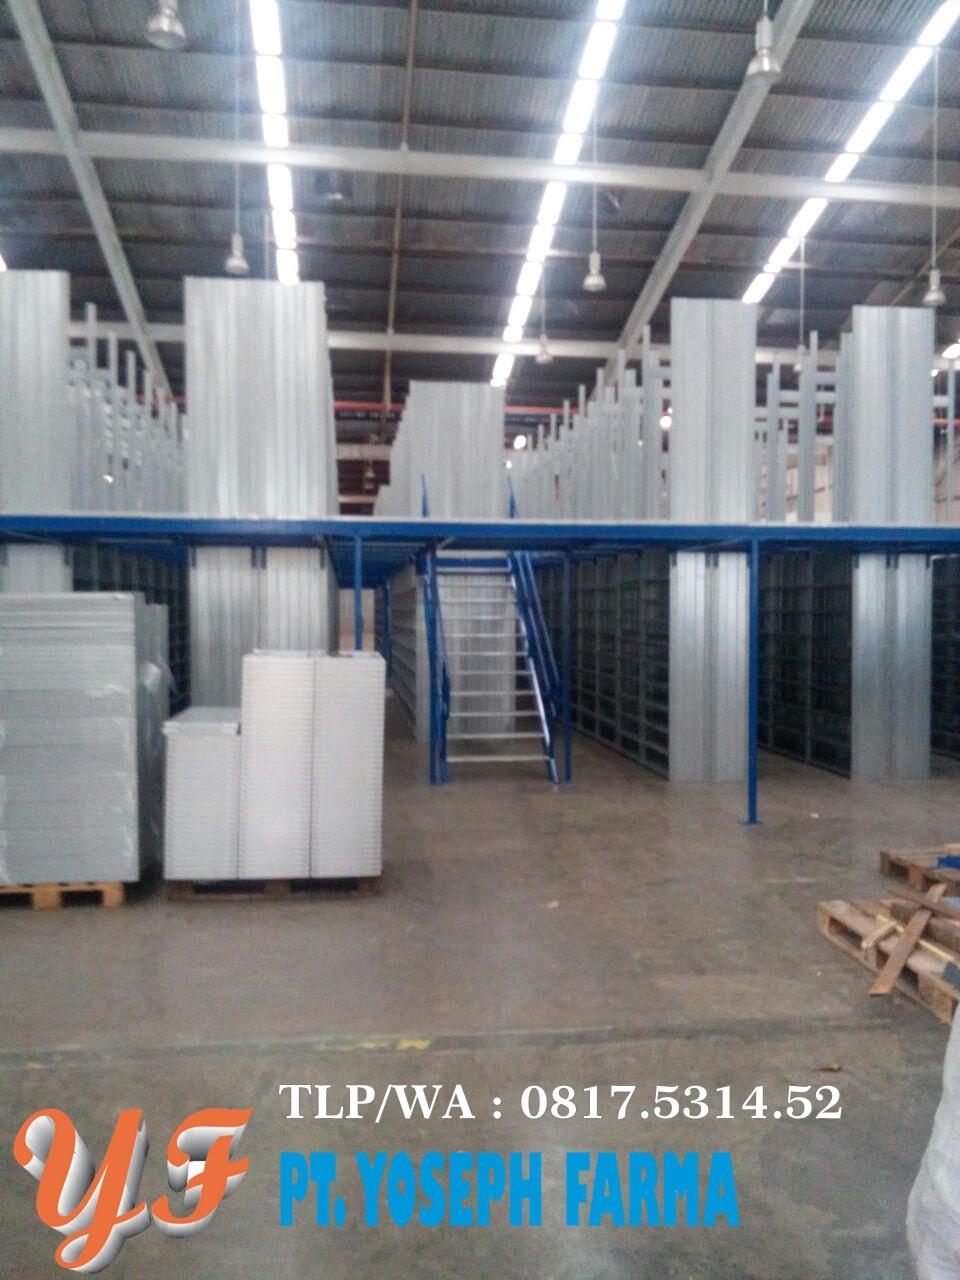 Rak Farmasi Wa 62 81 753 1452 Jual Rak Gudang Surabaya Halaman 4